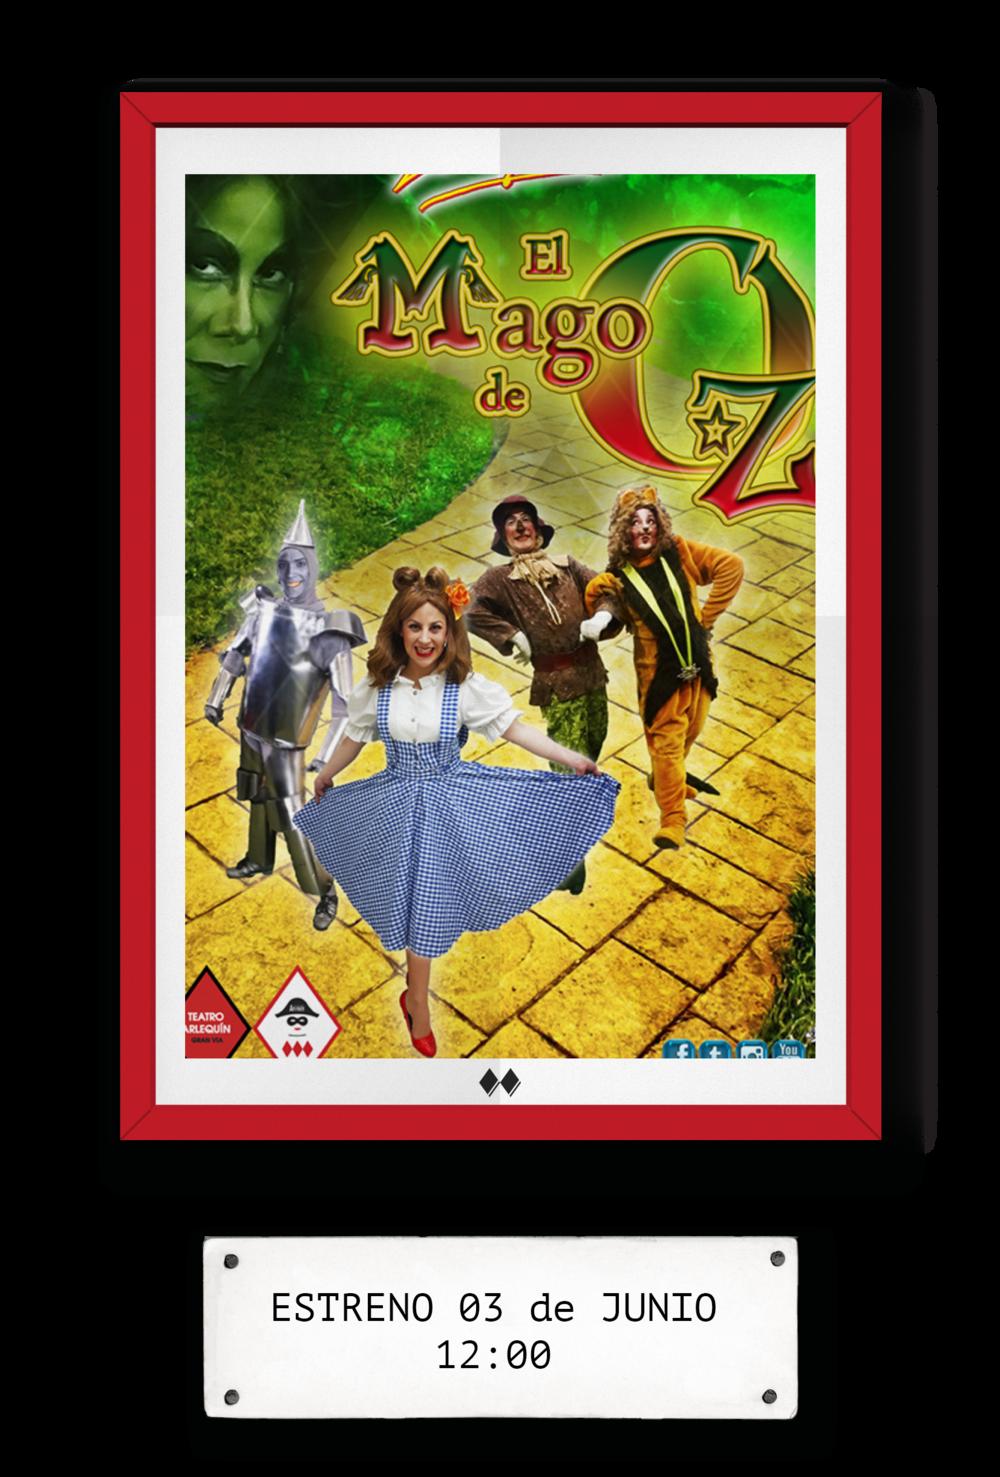 cuadro-mago-de-oz-madrid-infantil-teatro-arlequin-gran-via-comprar-entradas.png